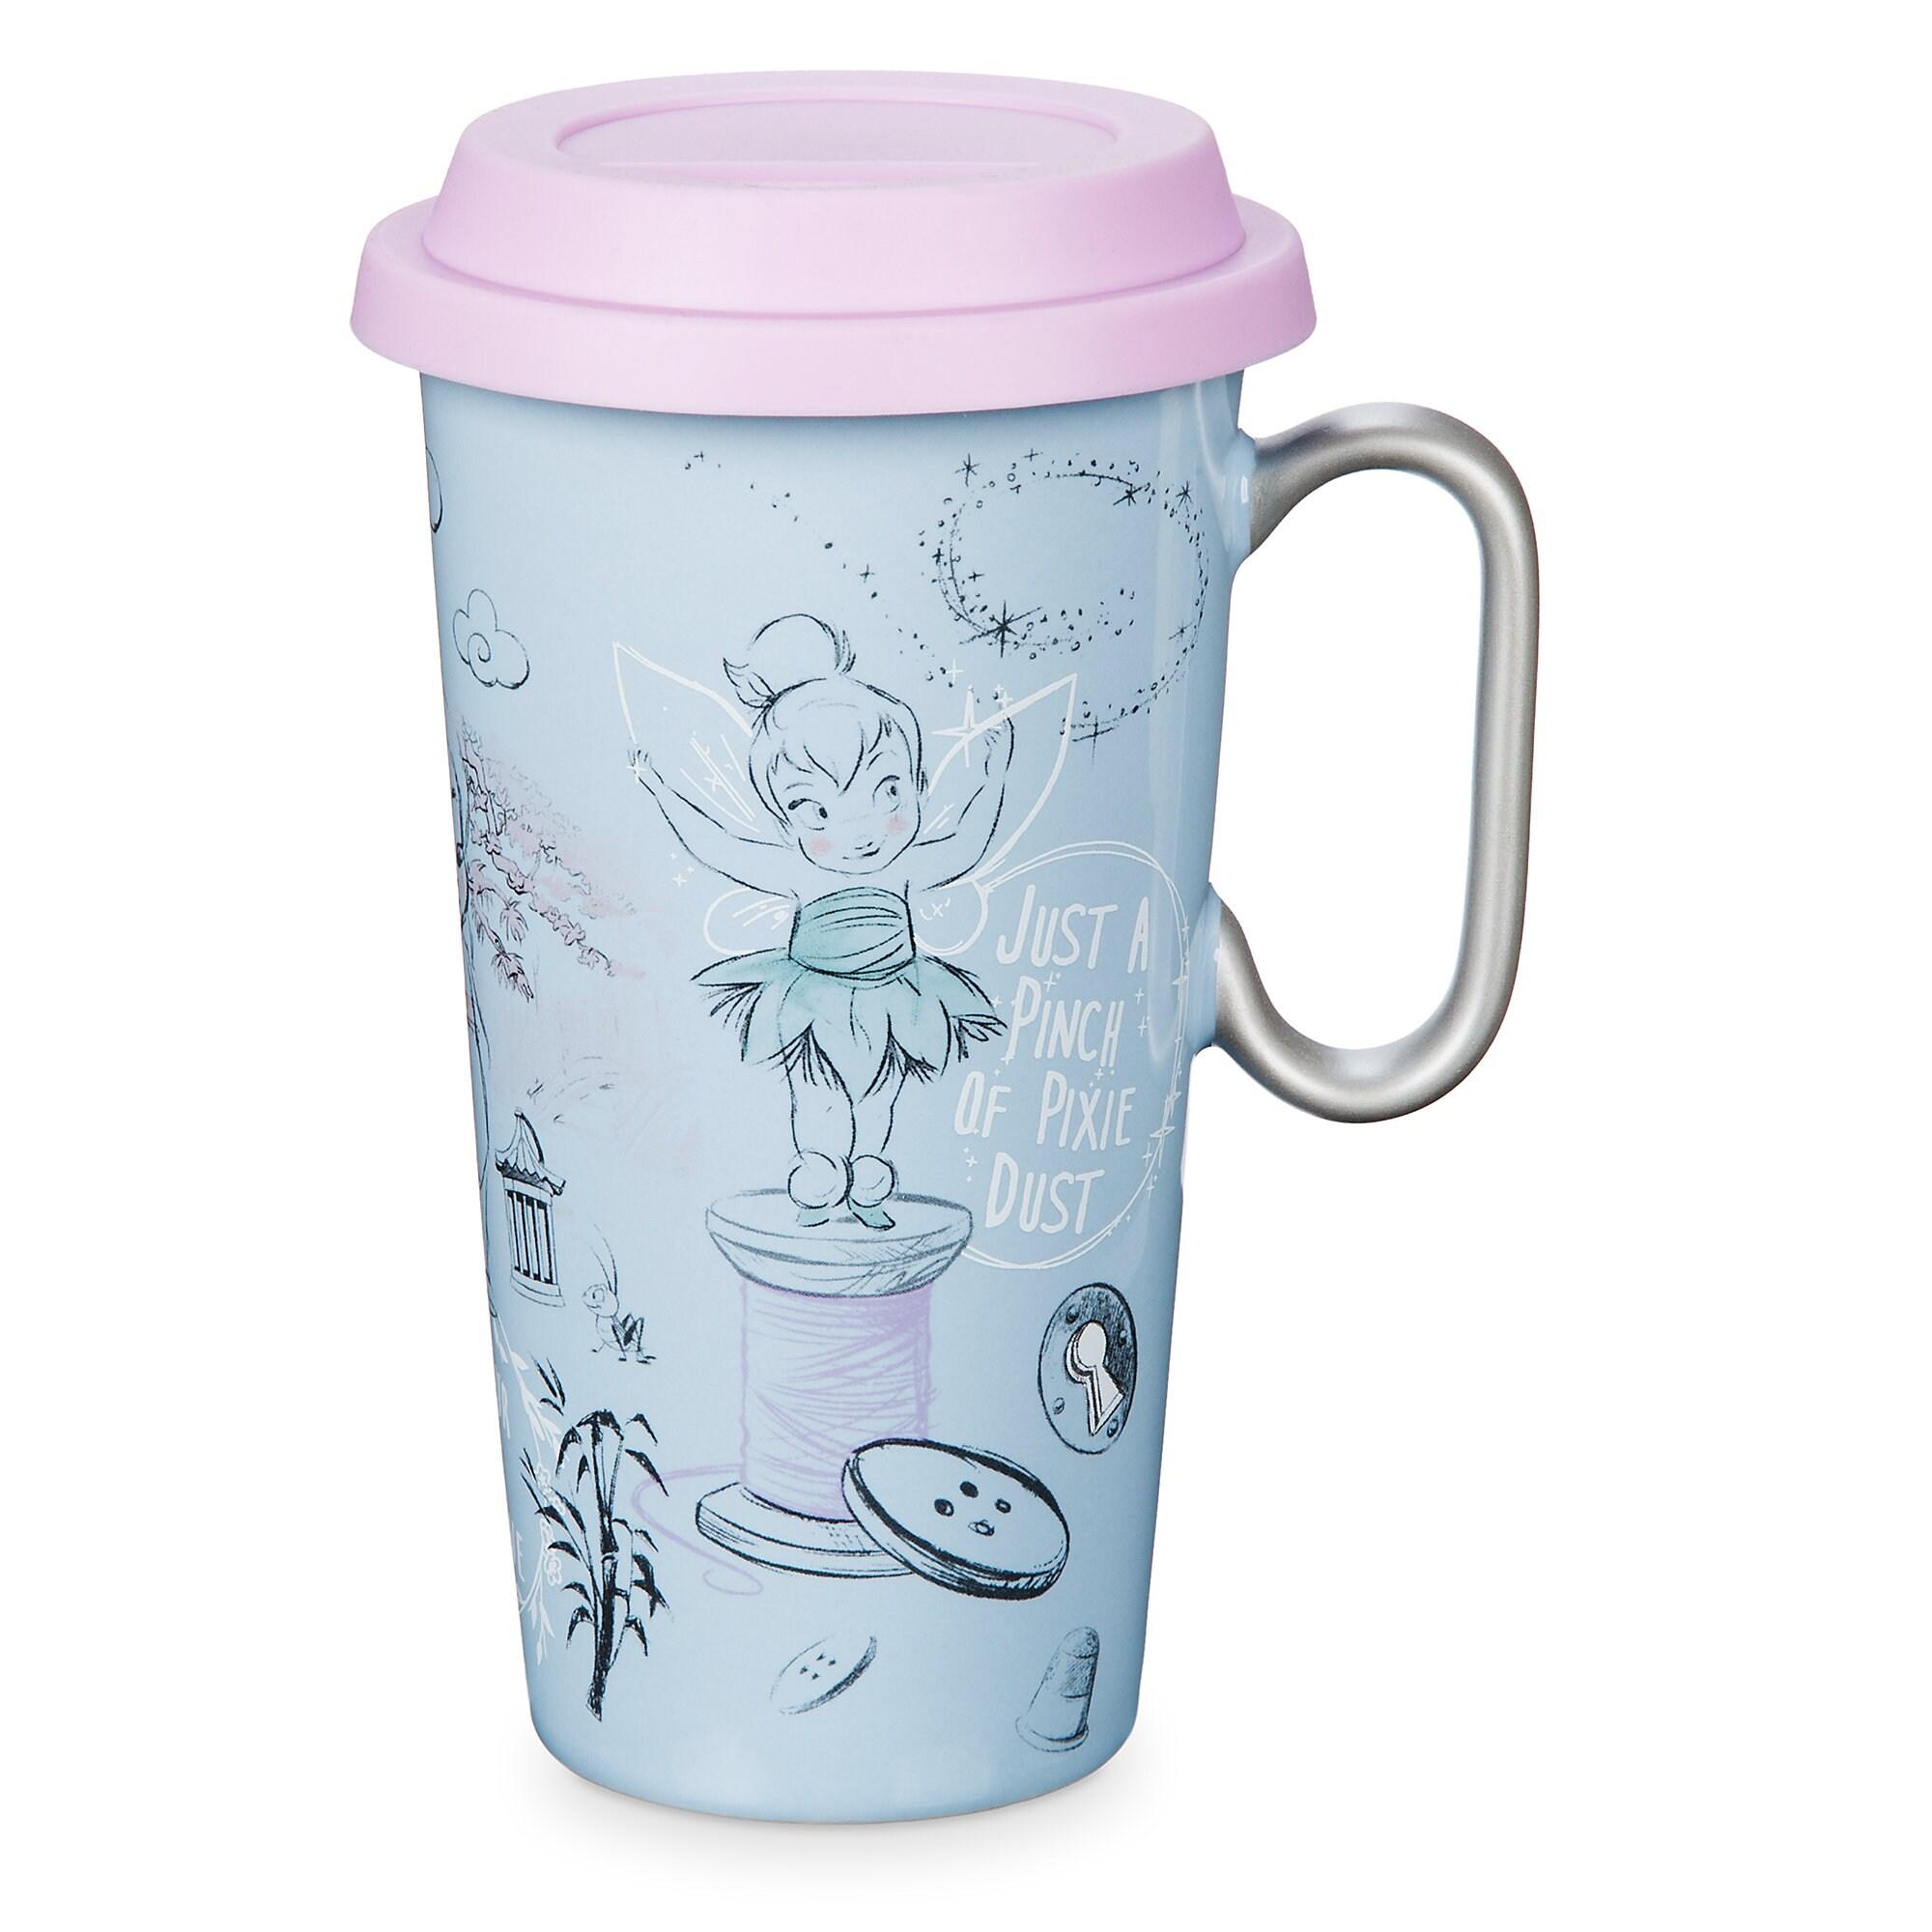 High Disney Collection Disney Princesses Travel Mug Disney Collection Disney Princesses Travel Mug Shopdisney Coffee Mug Collectors Board Coffee Mug Collectors furniture Coffee Mug Collection